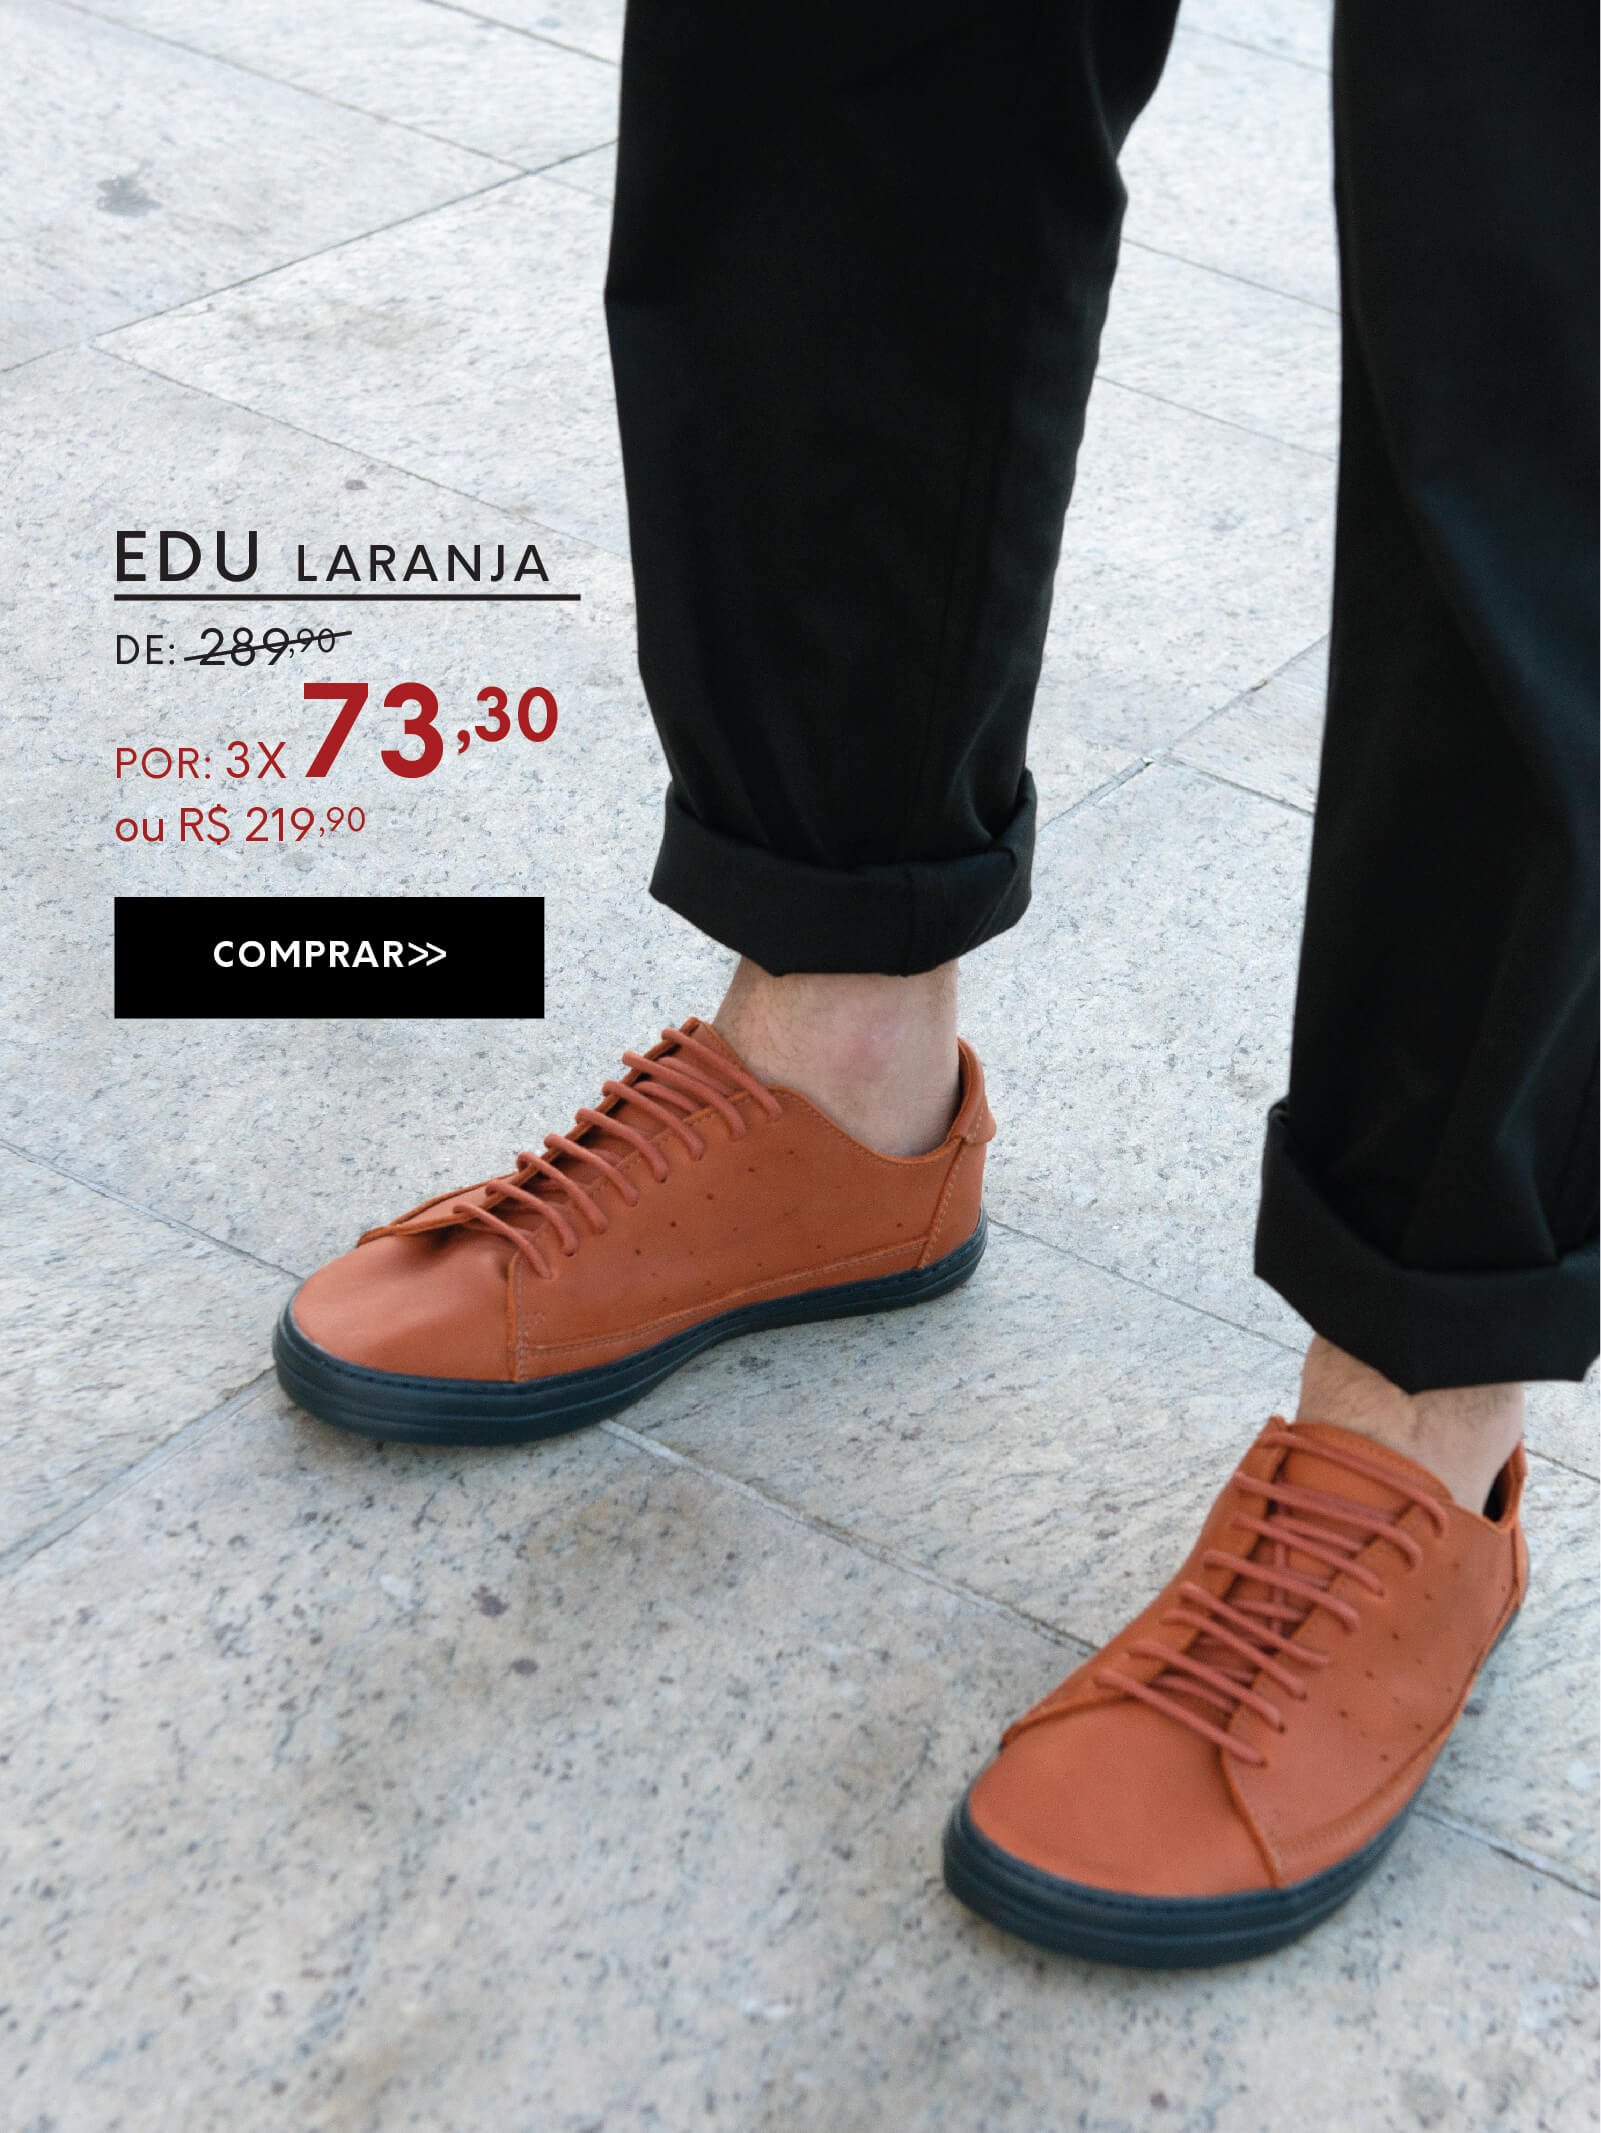 Mobile - Edu